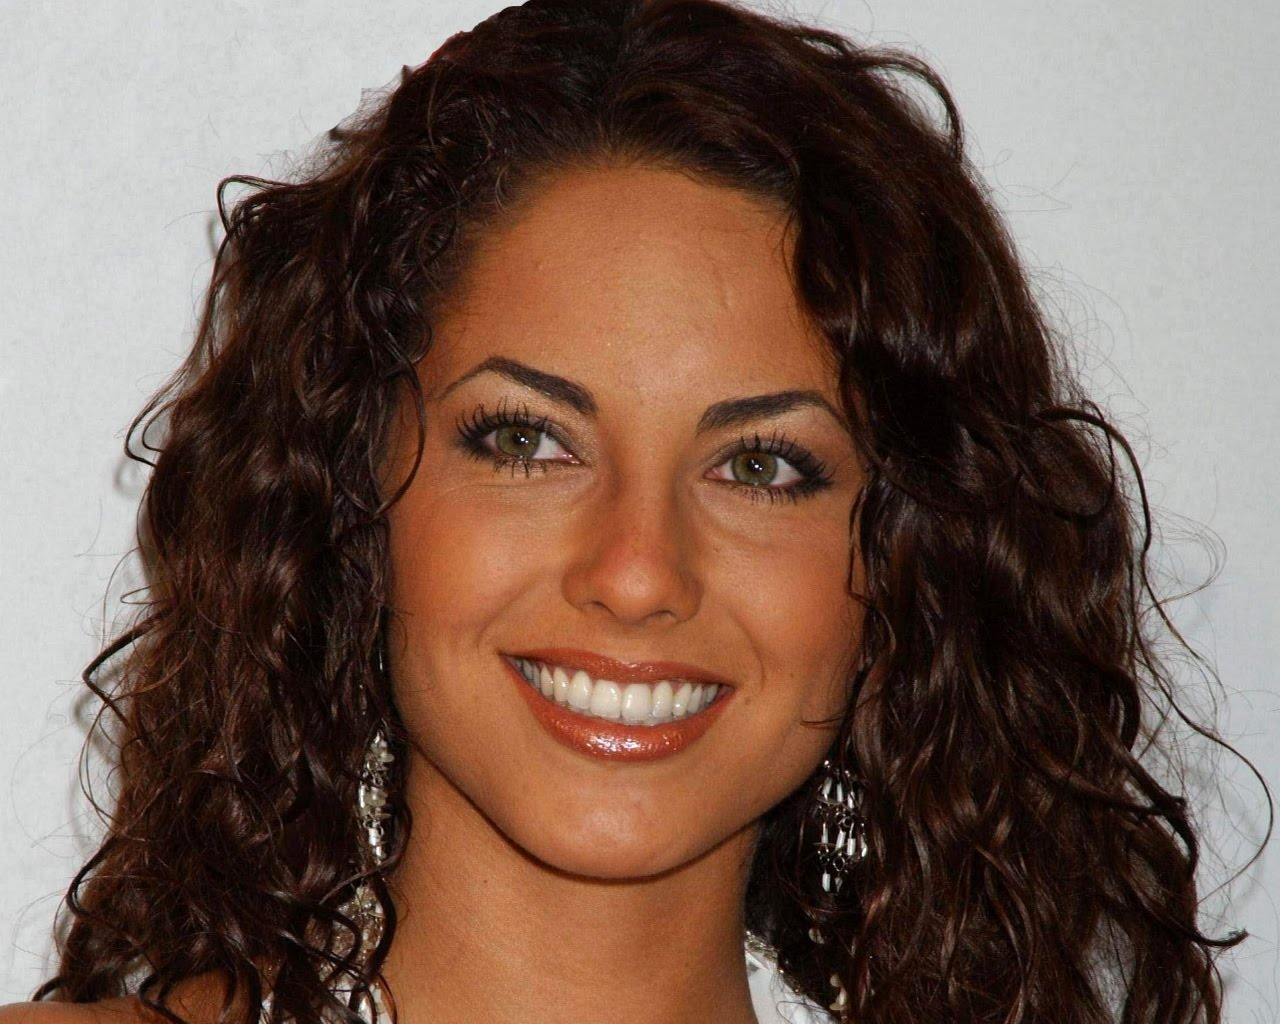 http://1.bp.blogspot.com/-bsvx4wBZ6h8/TYjJYobogpI/AAAAAAAALYk/-SQheOUgplo/s1600/Mexican_actress_barbara_mori_wallpapers%2B%25284%2529.jpg